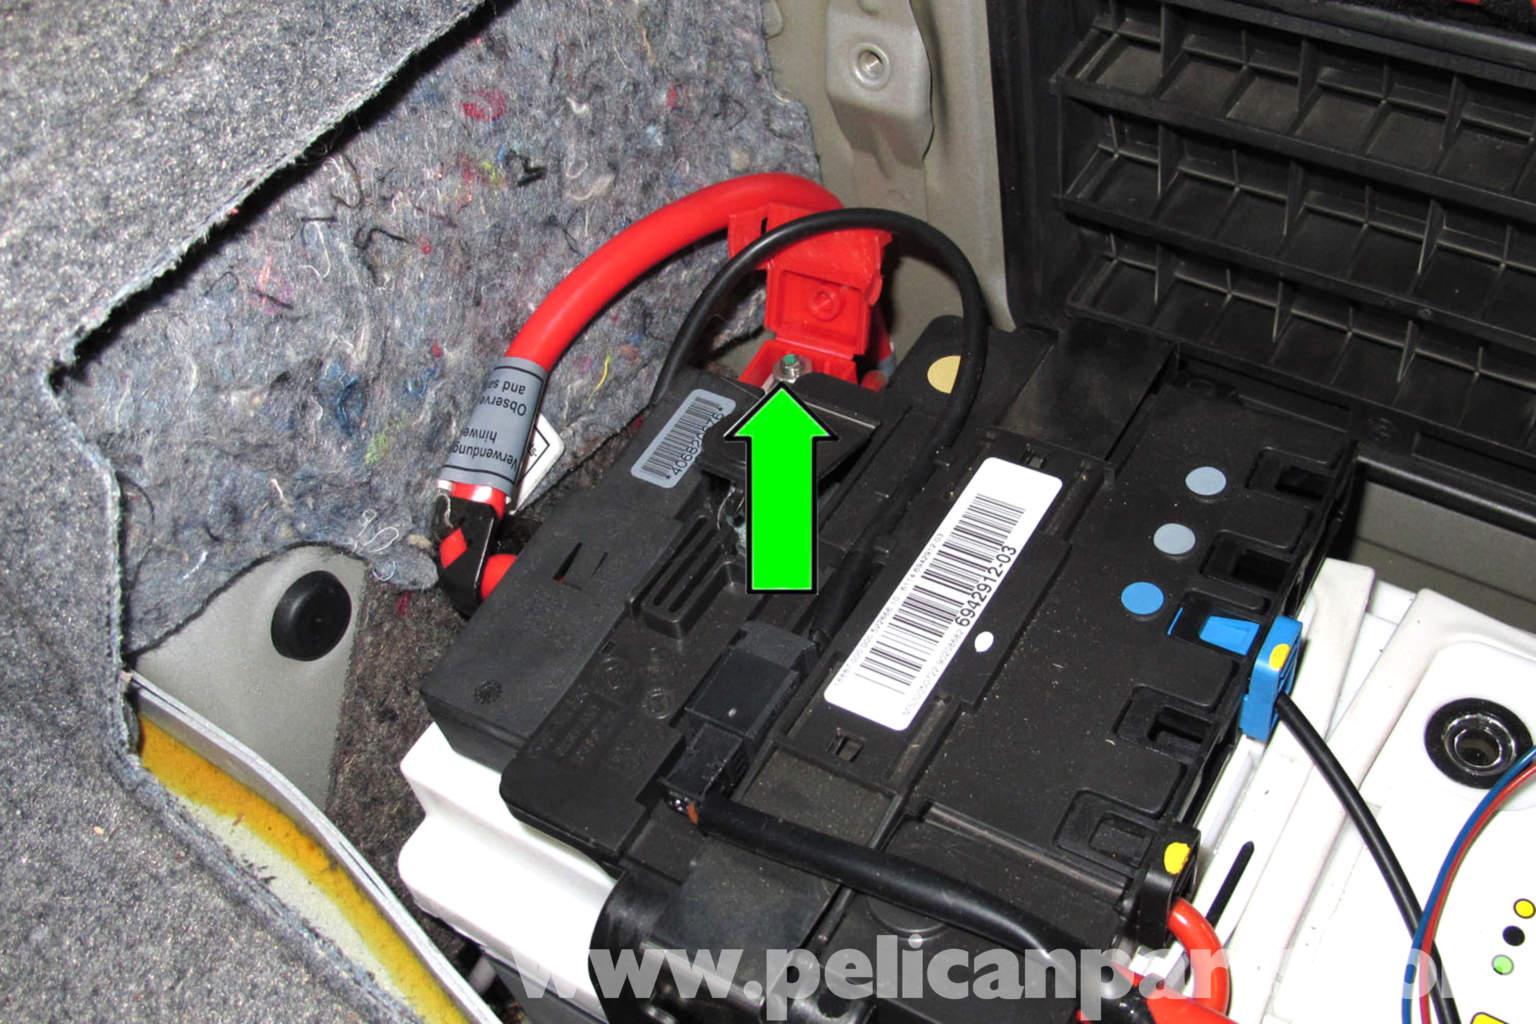 bmw z3 wiring diagram radio rv water tank e90 battery replacement | e91, e92, e93 pelican parts diy maintenance article